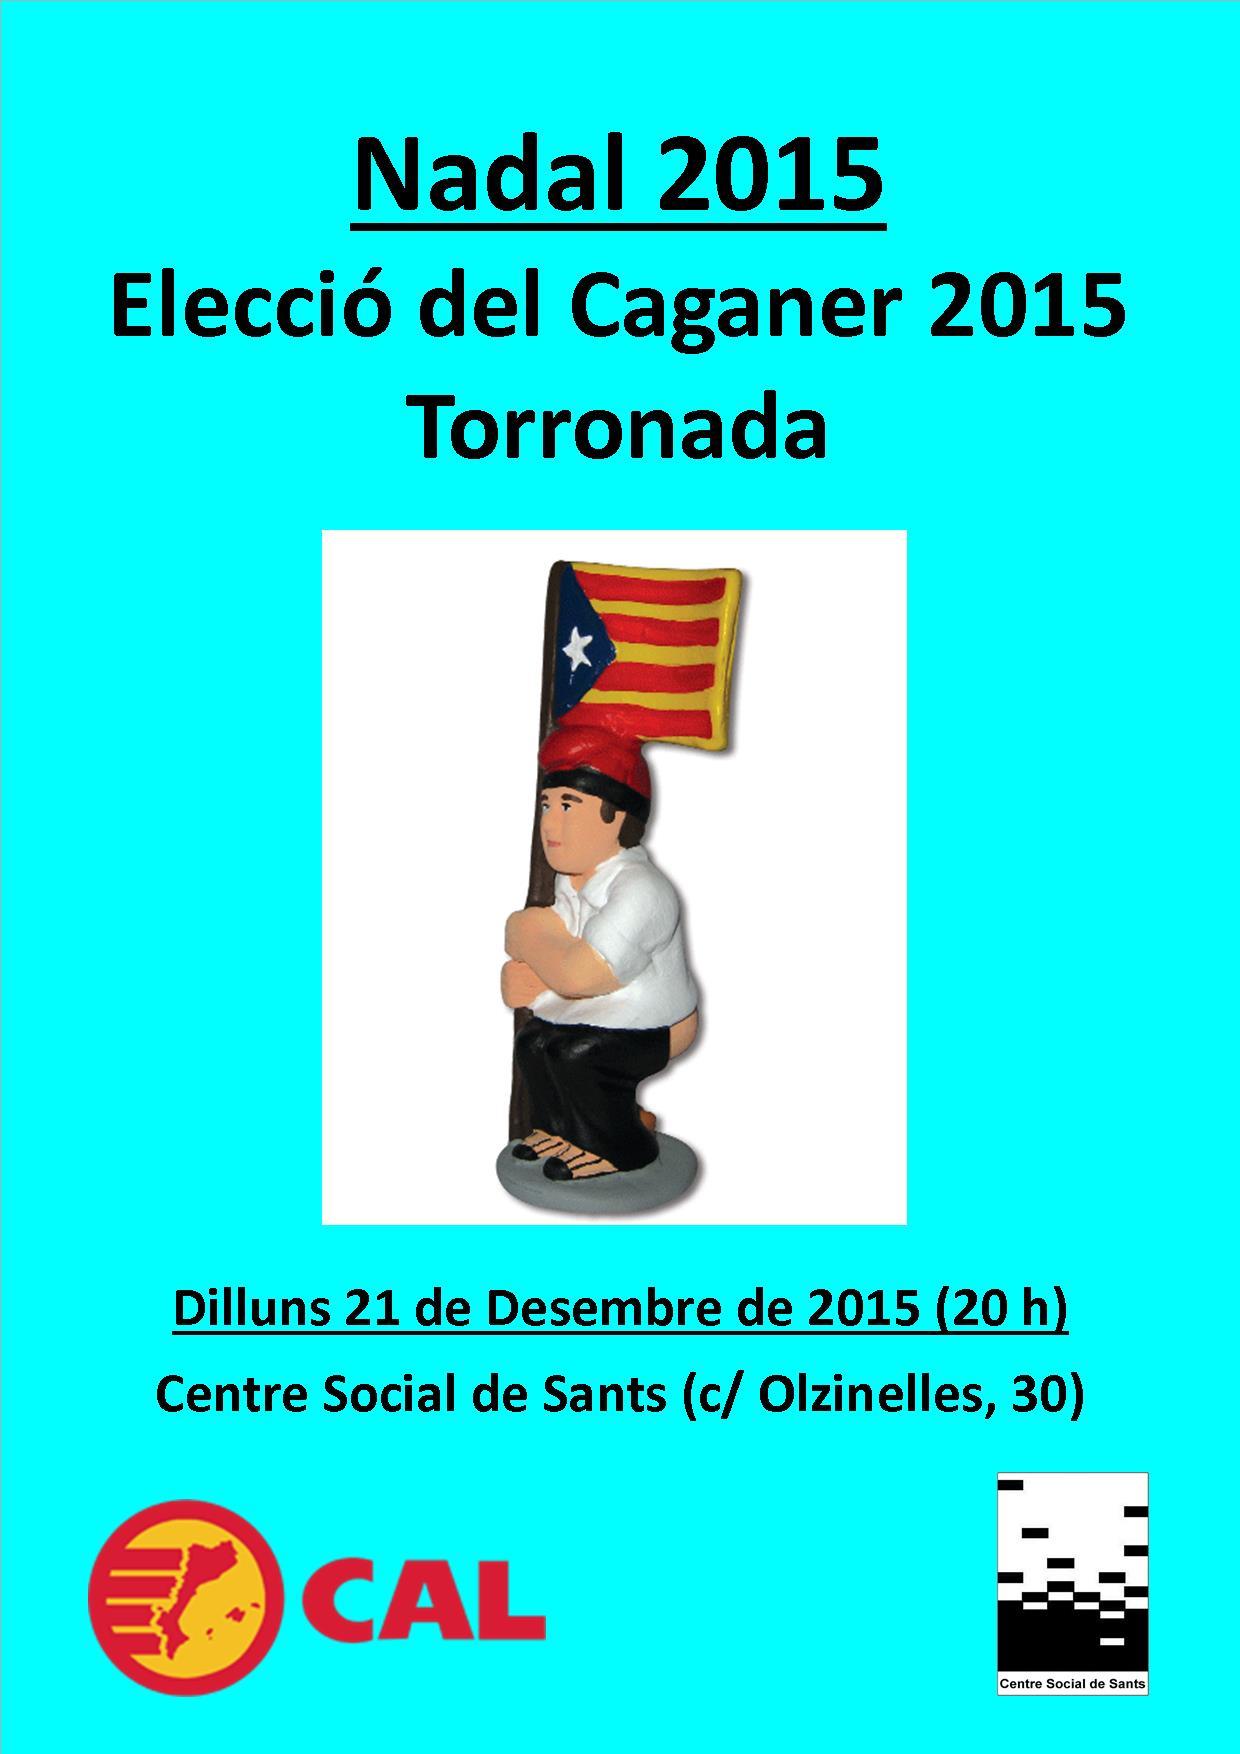 20151221 Torronada i Caganer 2015